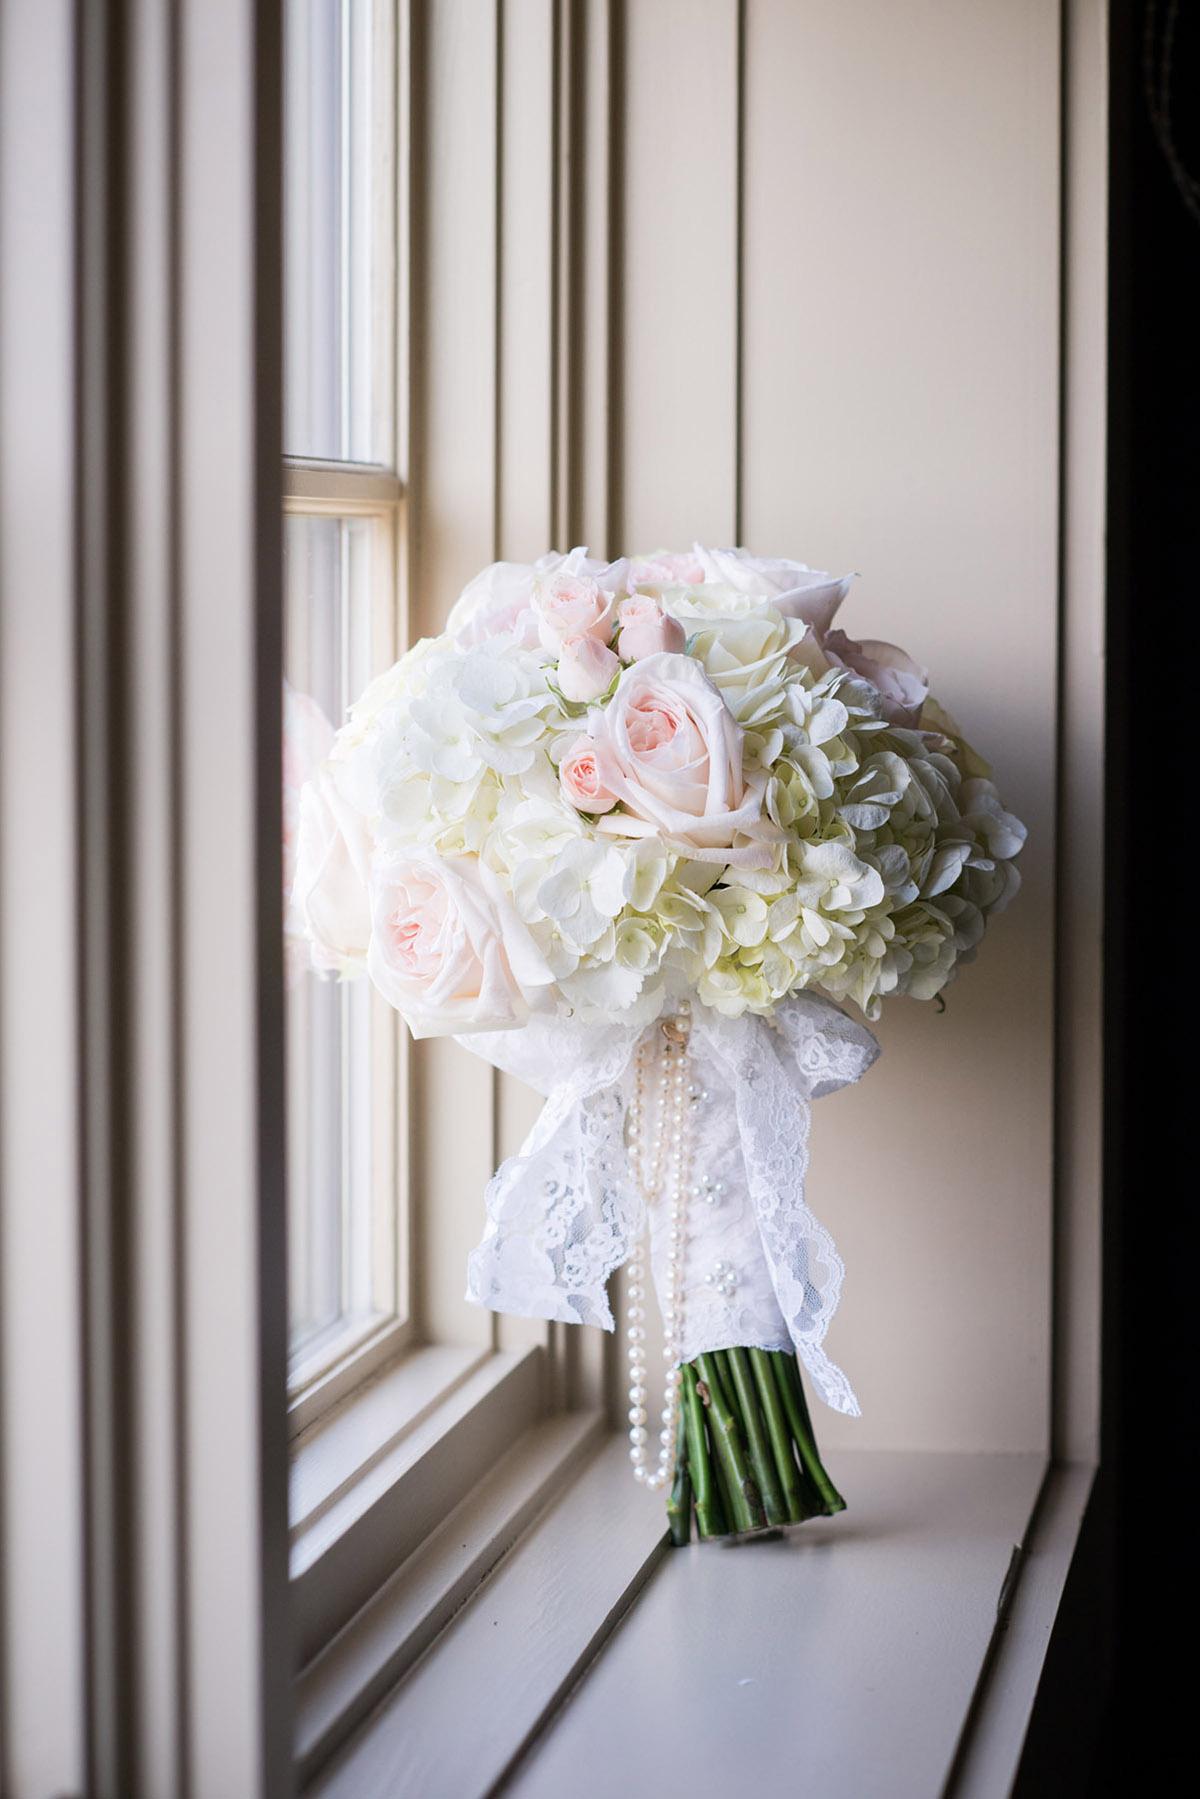 The bride's wedding bouquet